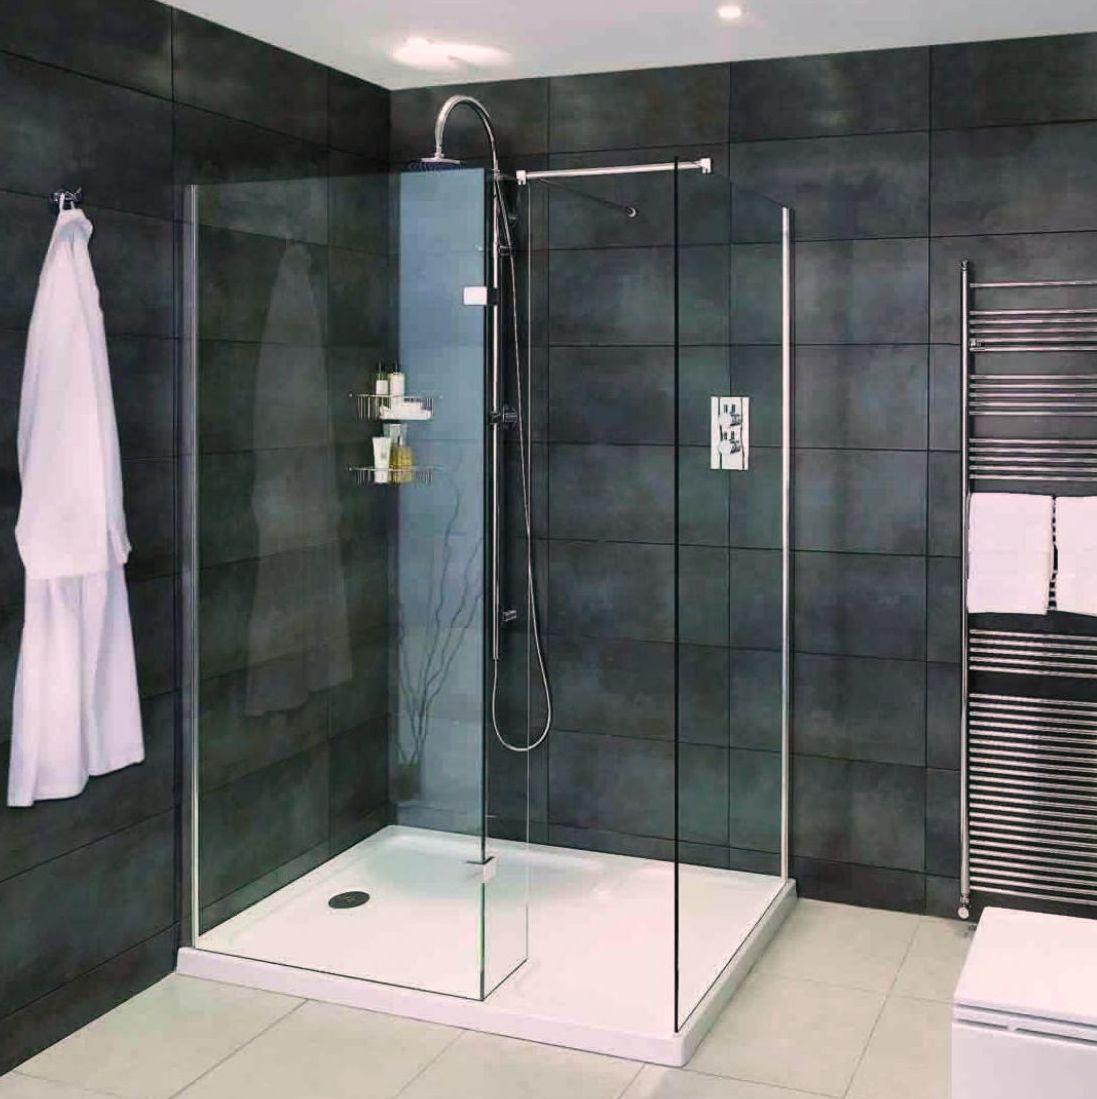 Shower Enclosures Including Walking Showers  Quadrant Enclosures - Shower doors for walk in showers